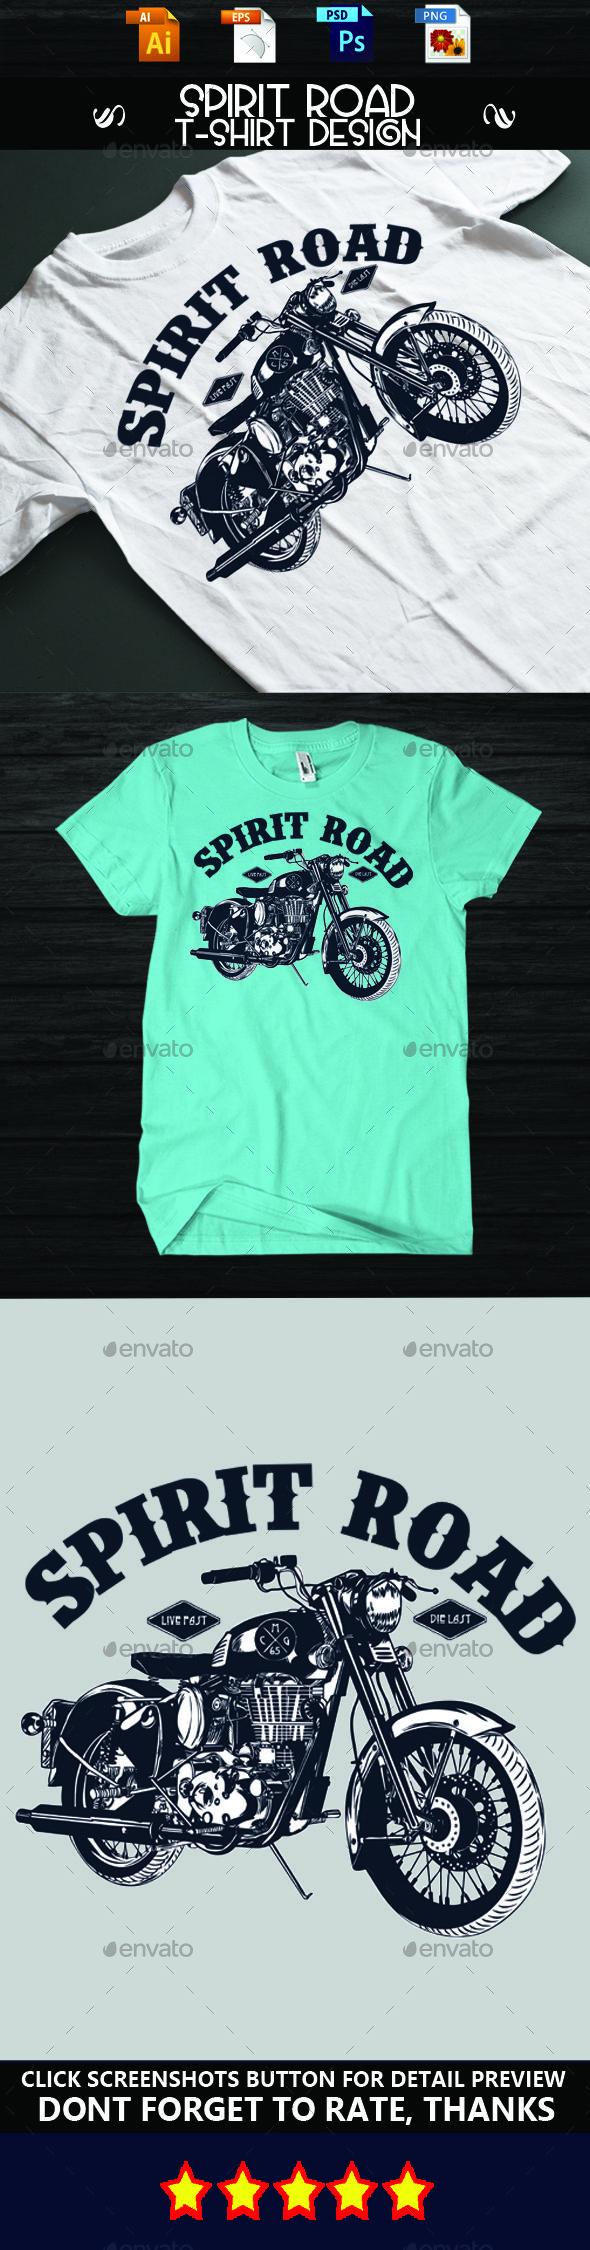 Shirt design eps - Spirit Road T Shirt Design